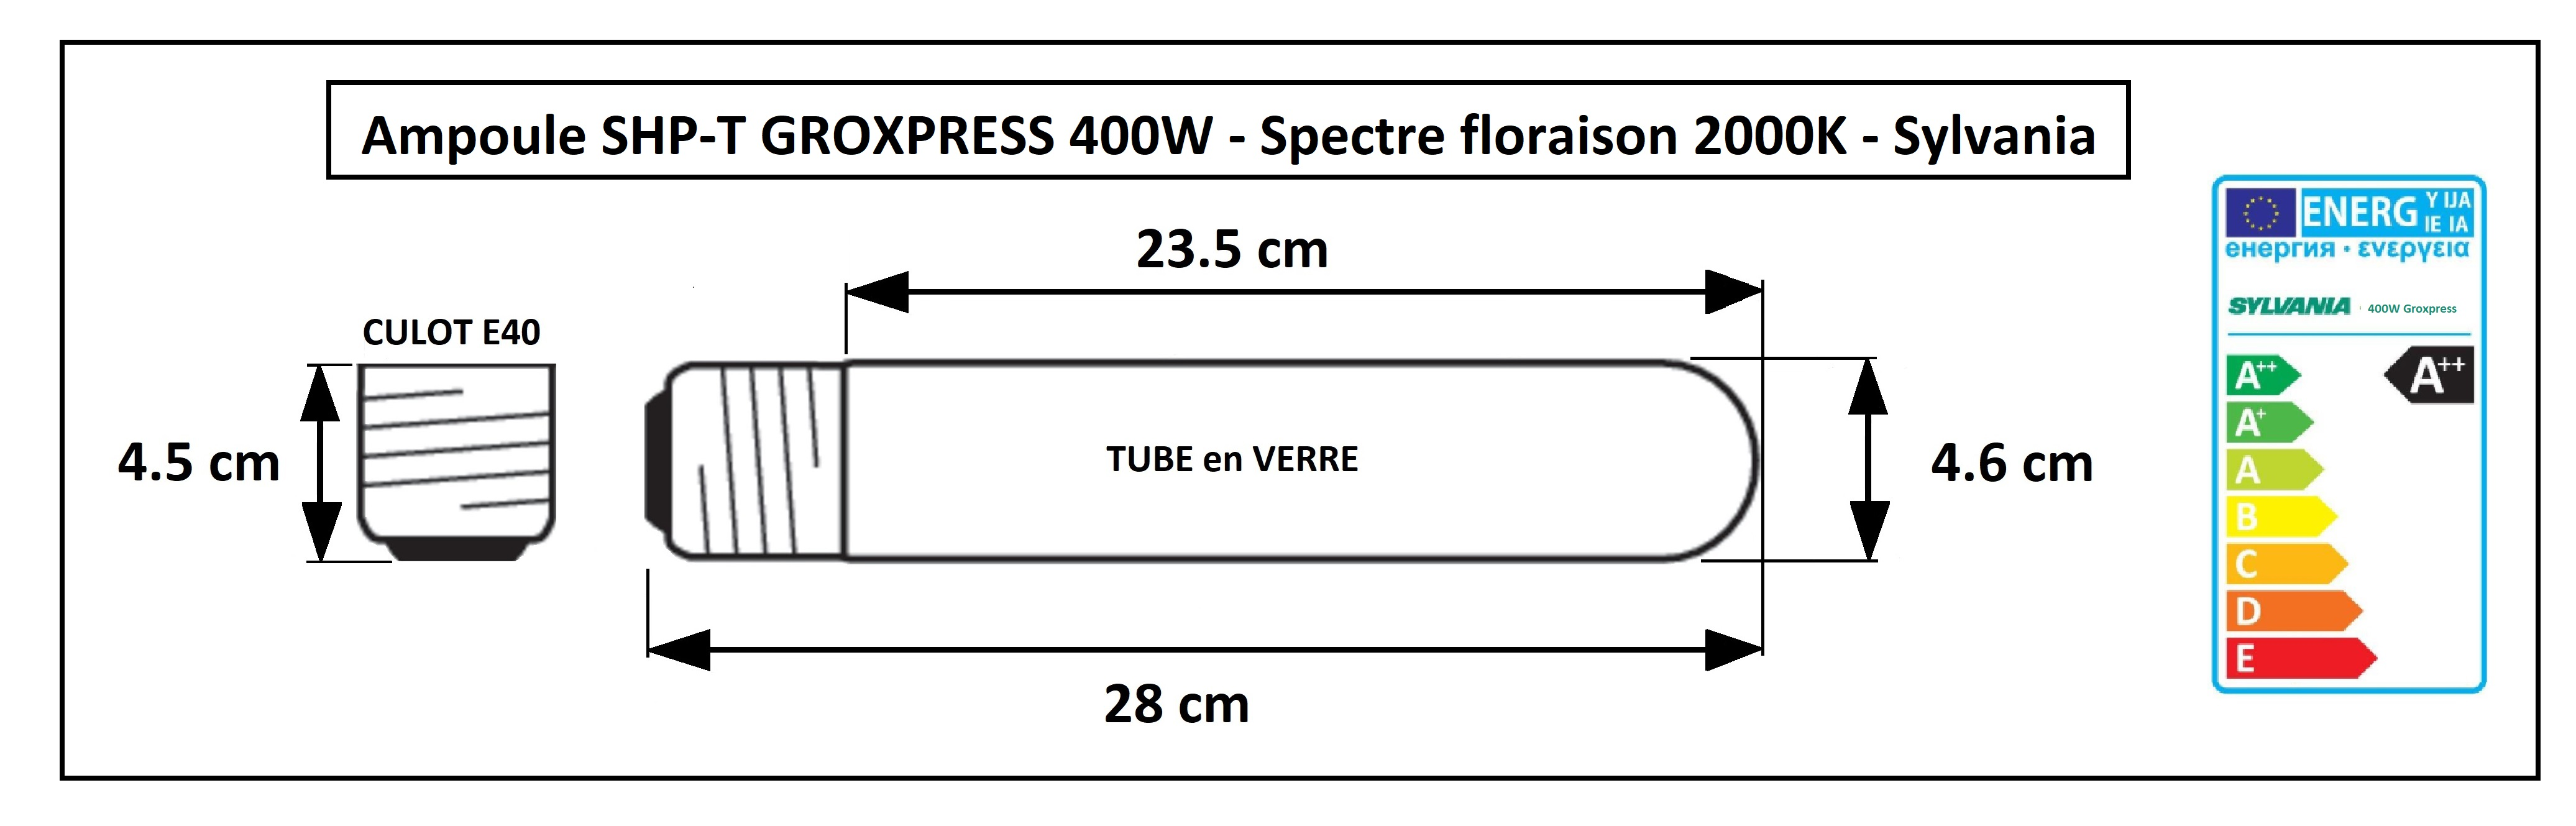 Dimensions de la lampe Groxpress 400W Sylvania